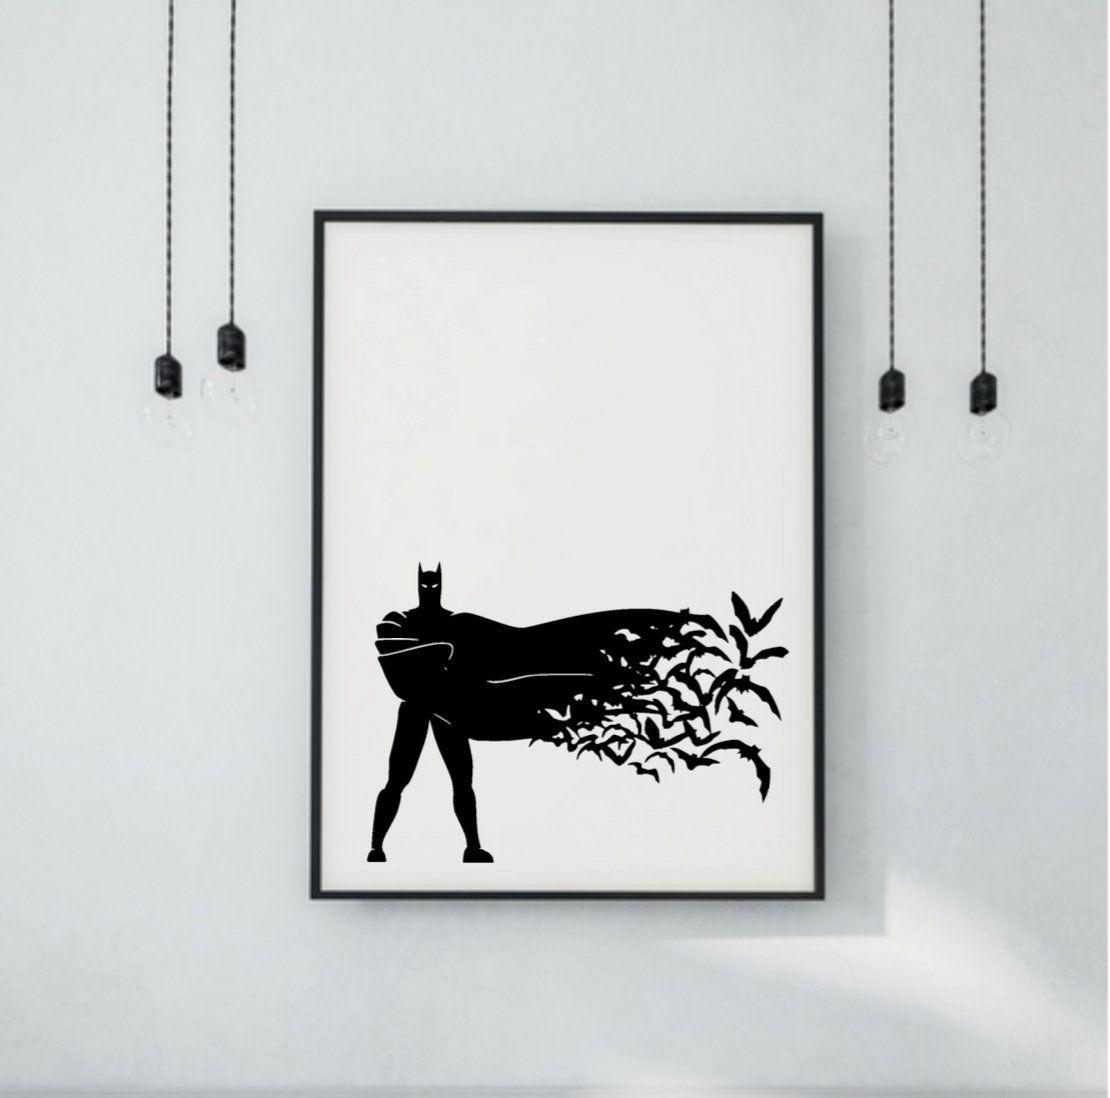 Batman Print Printable Wall Art Batman And Bats Silhouette Printable For Batman Wall Art (View 16 of 20)